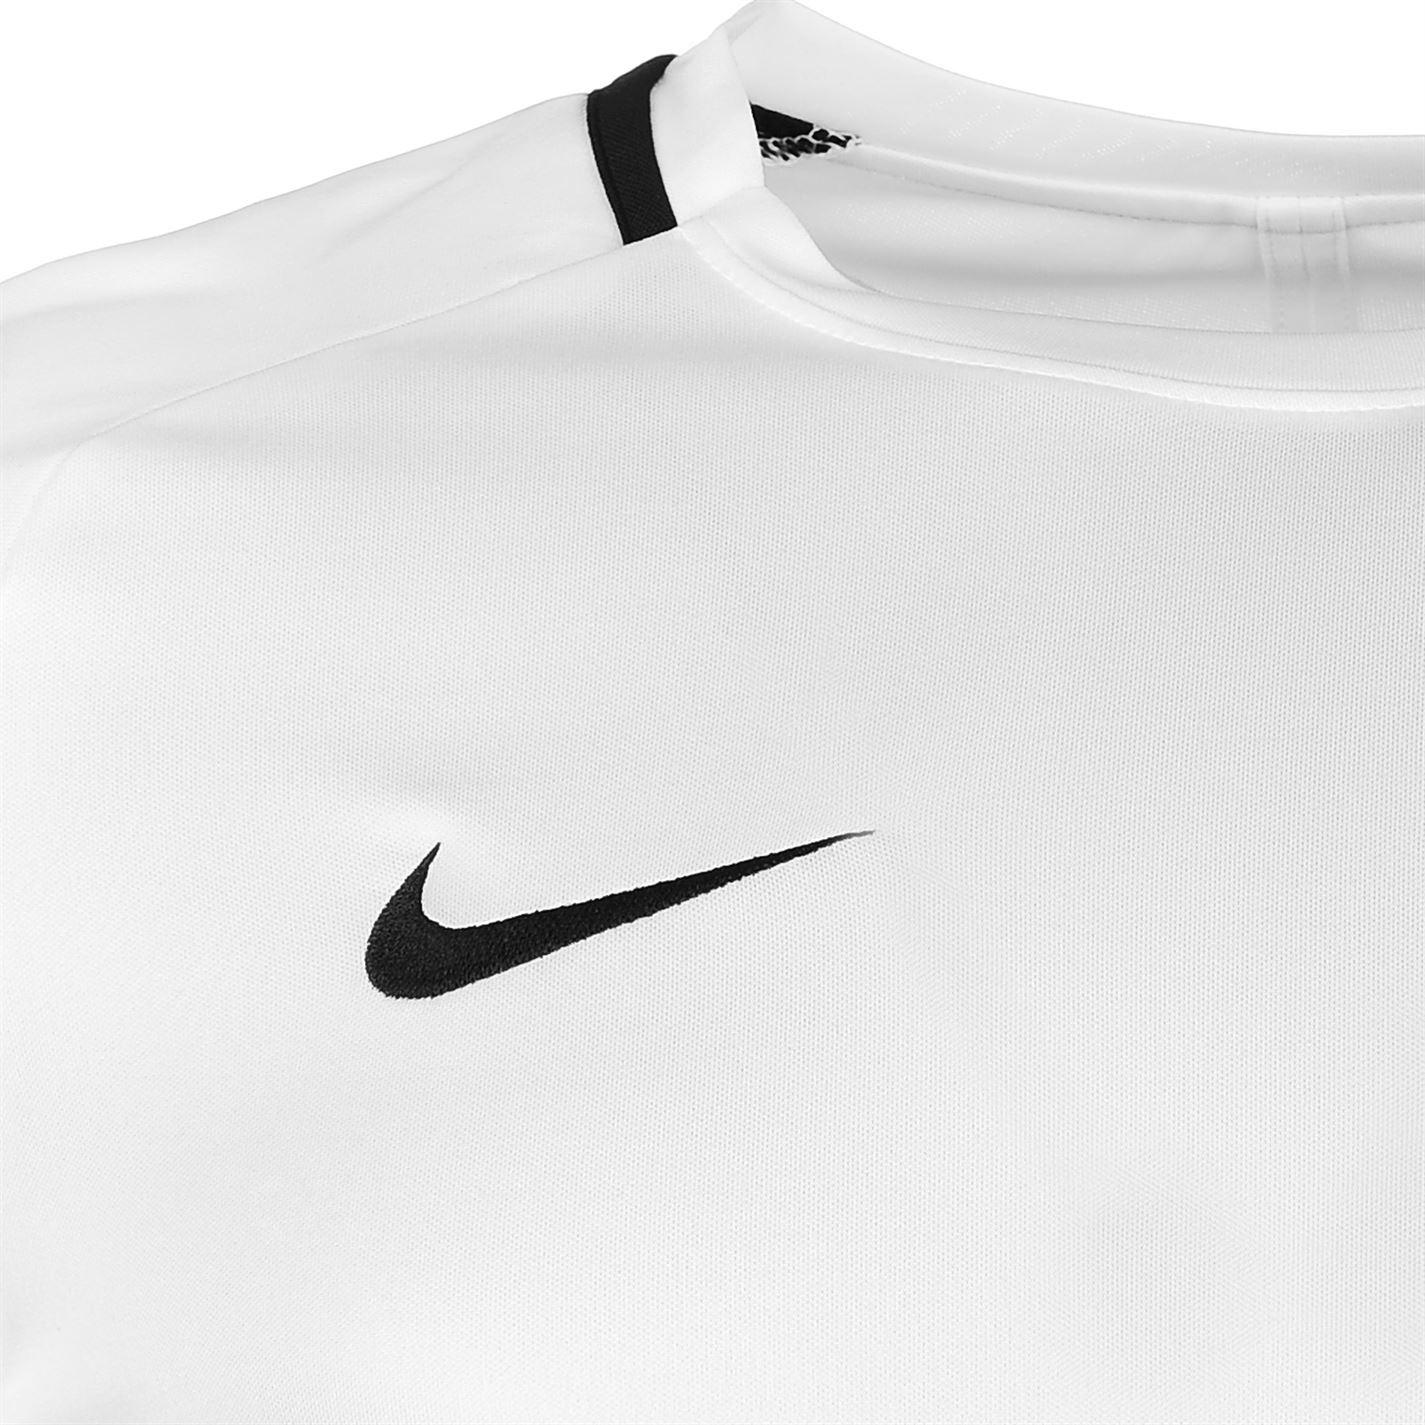 dd287efe7 ... Nike Academy Training T-Shirt Mens White Black Football Soccer Top Tee  Shirt